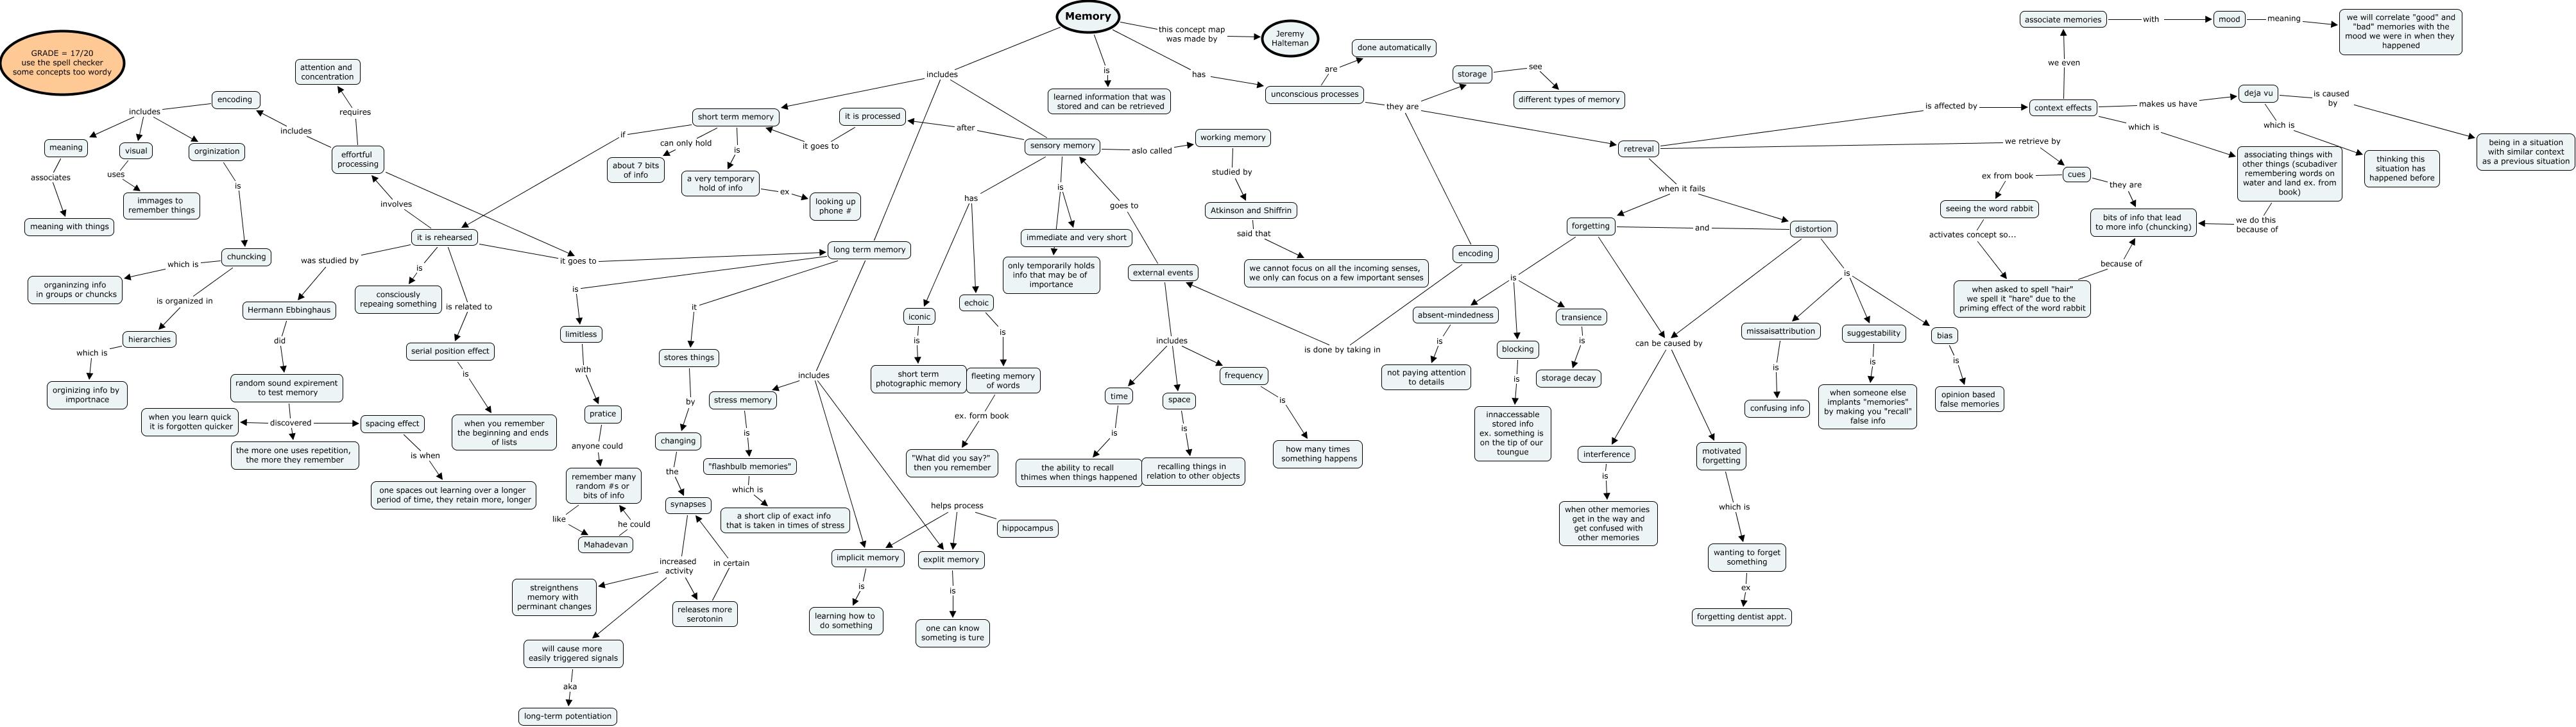 Memory Ch 8 Concept Map Jeremy Halteman